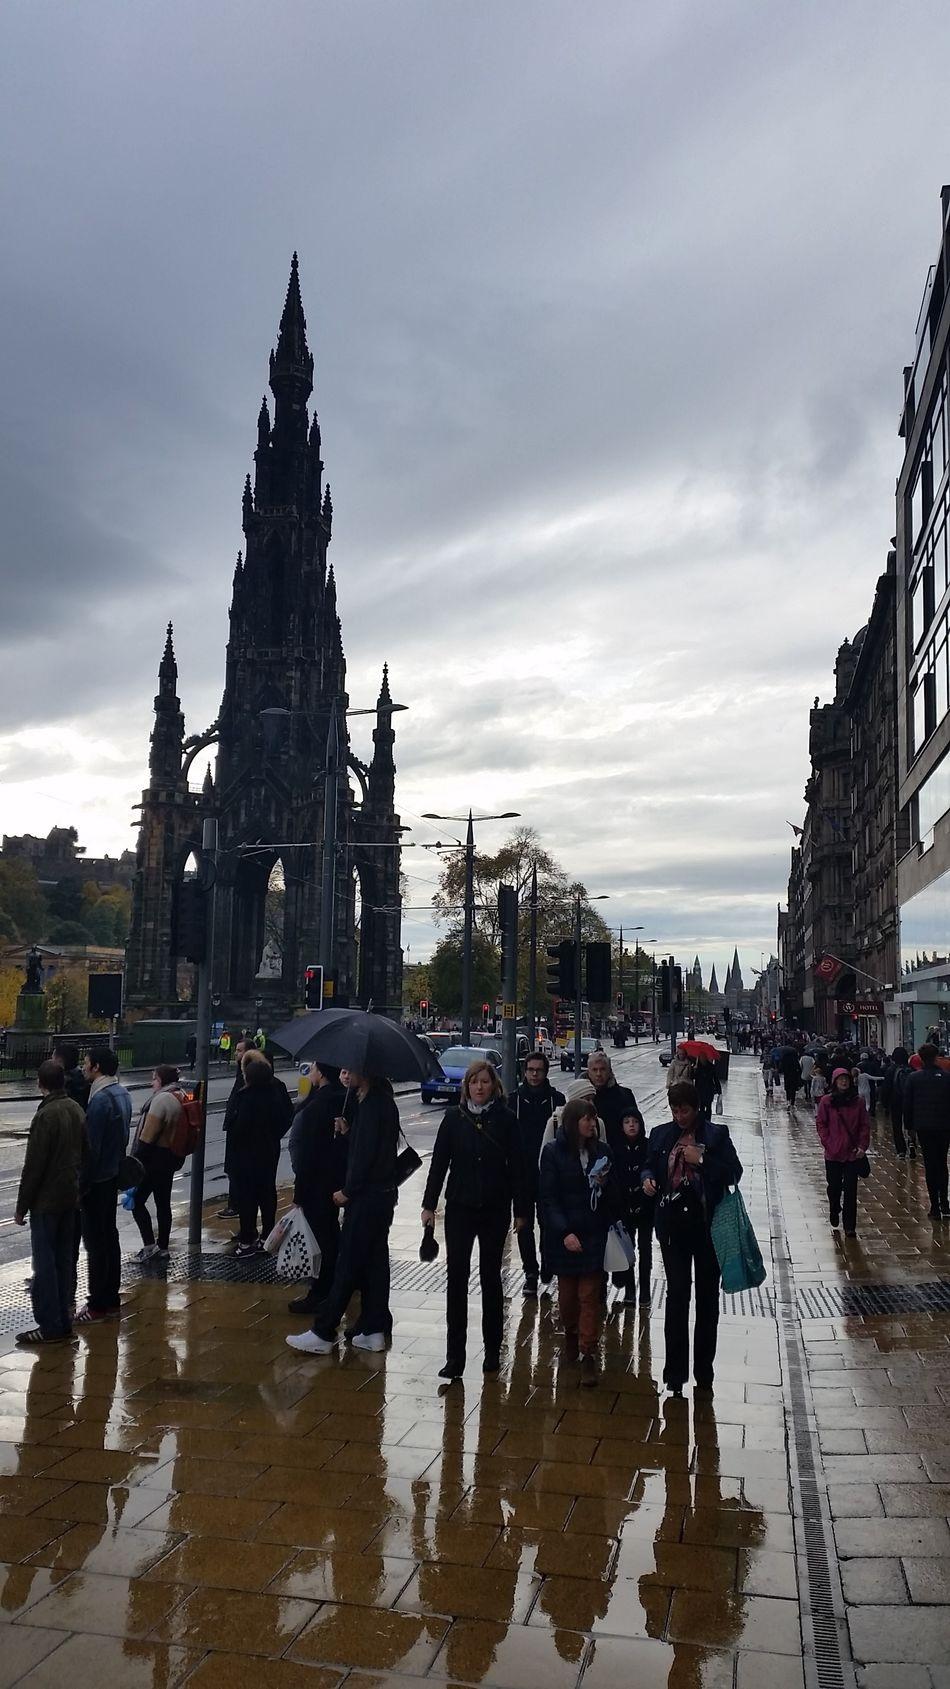 Princes Street Edinburgh Scotland Rainy Days Reflections Exceptional Photographs EyeEm Masterclass Travel Photography Reedited Eye4photography  EyeEm Best Shots Large Group Of People Travel Destinations Reflections In The Rain